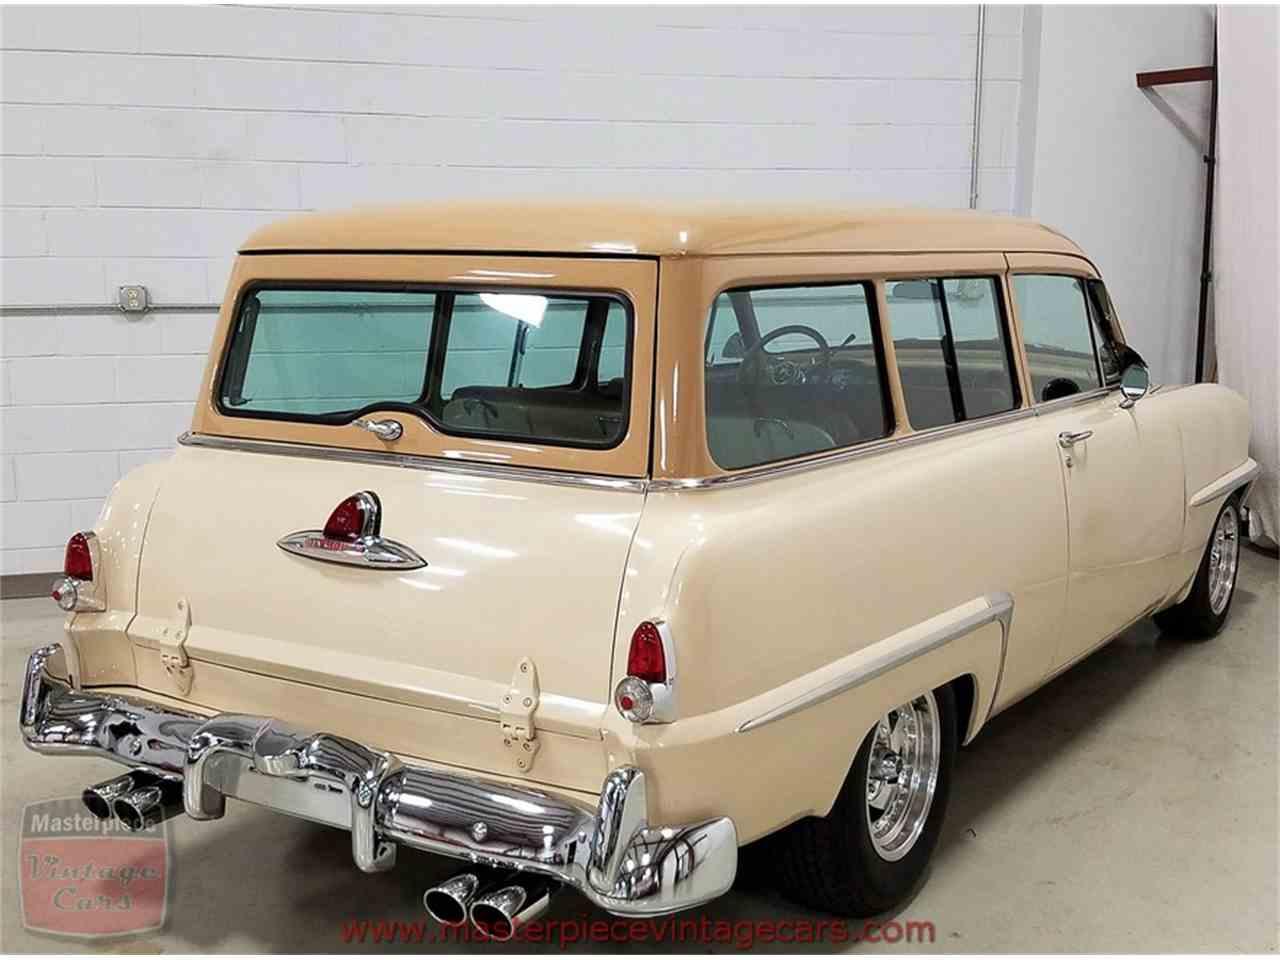 1954 Plymouth Plaza Suburban for Sale   ClassicCars.com   CC-973449